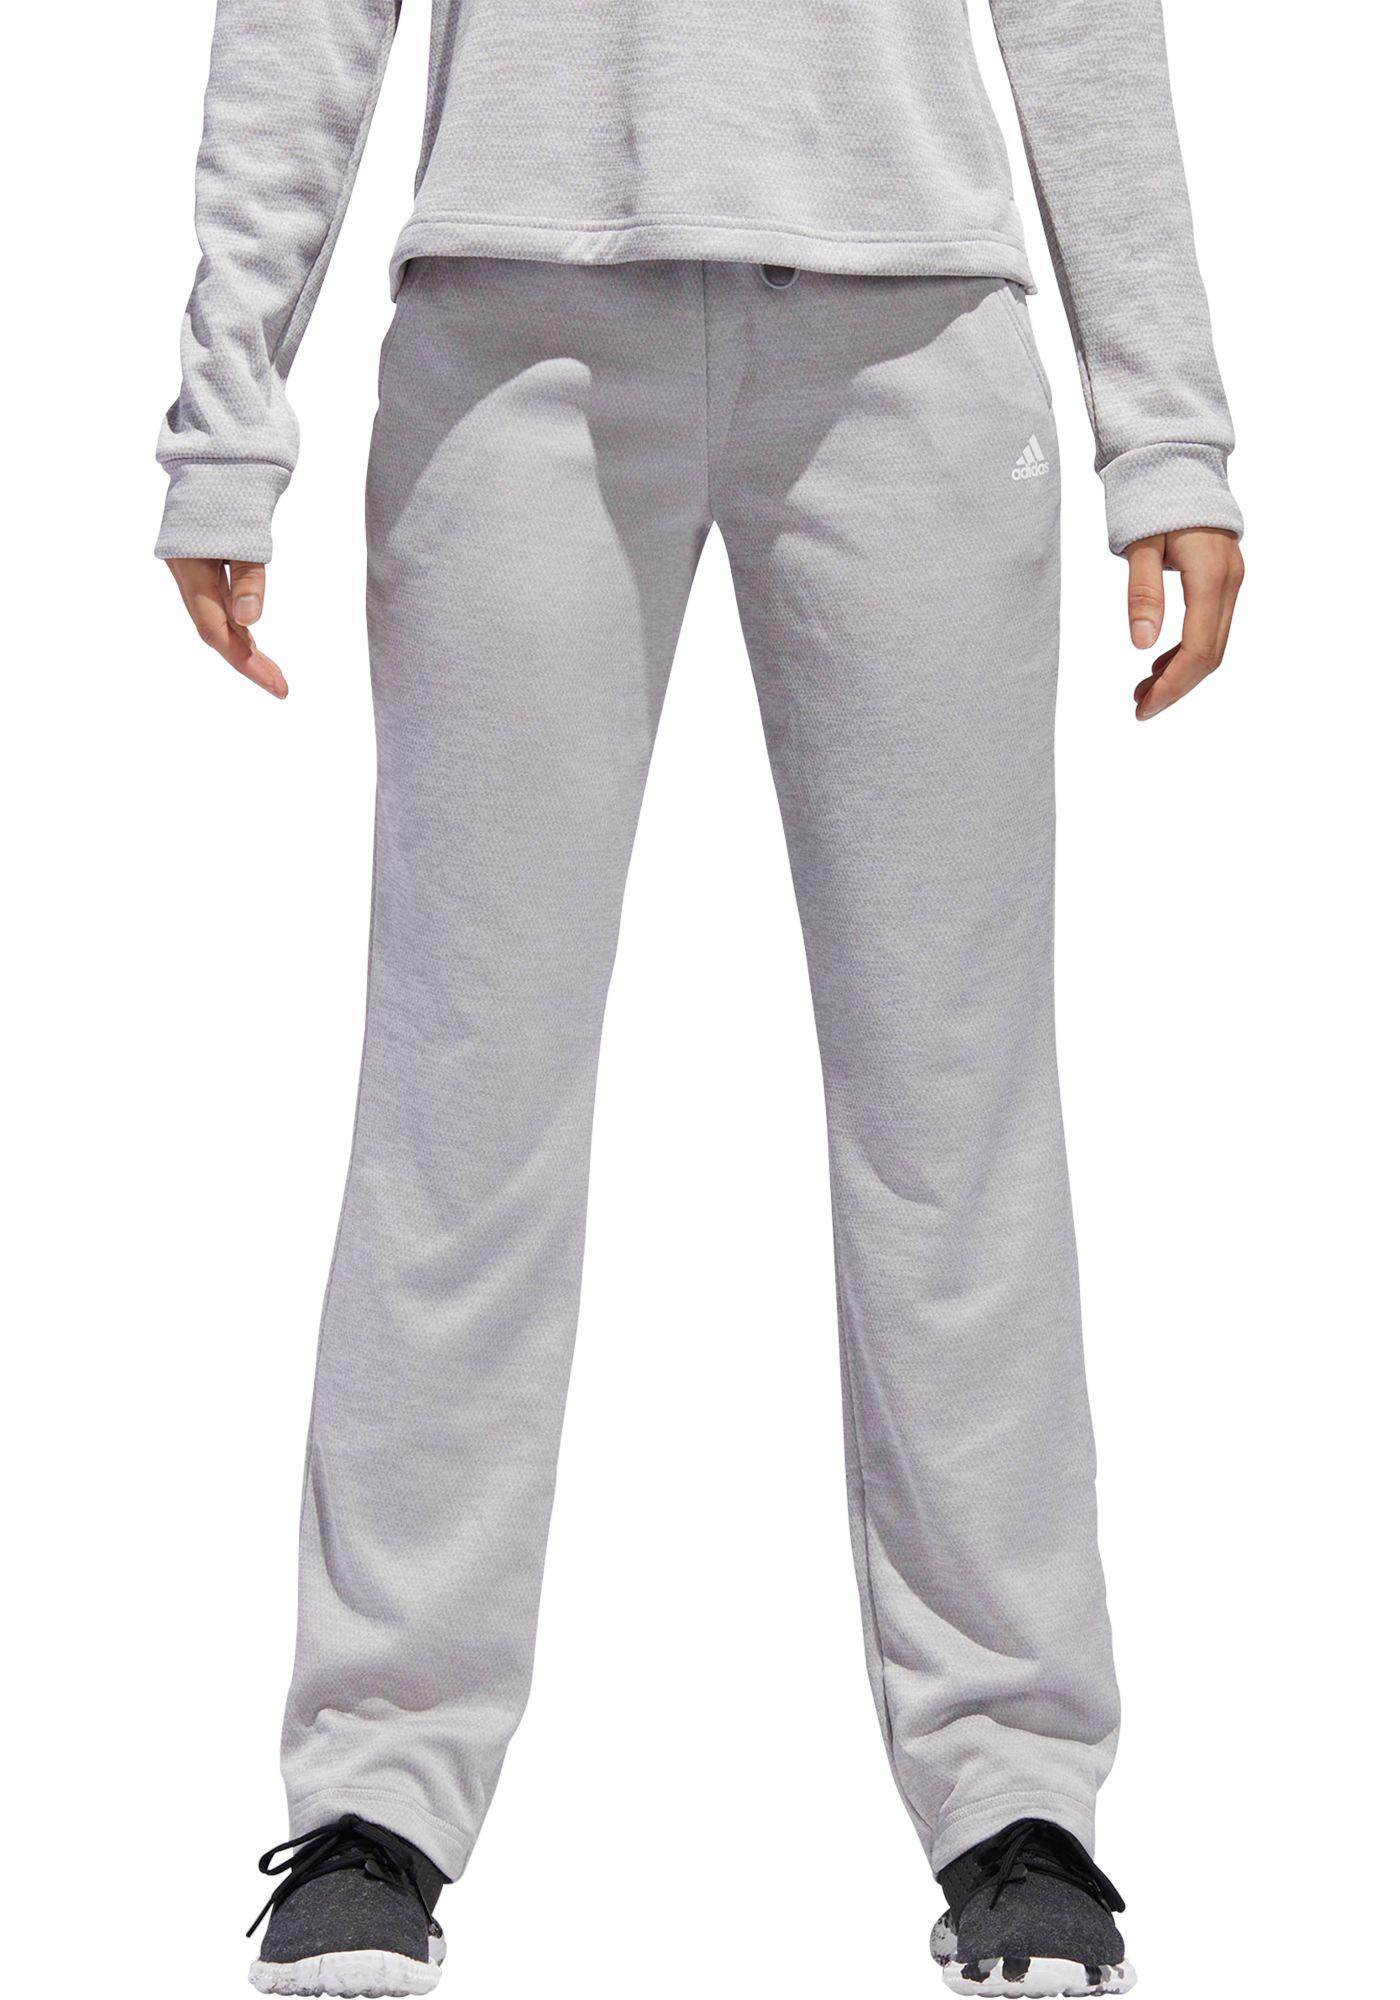 adidas Women's Team Issue Pants